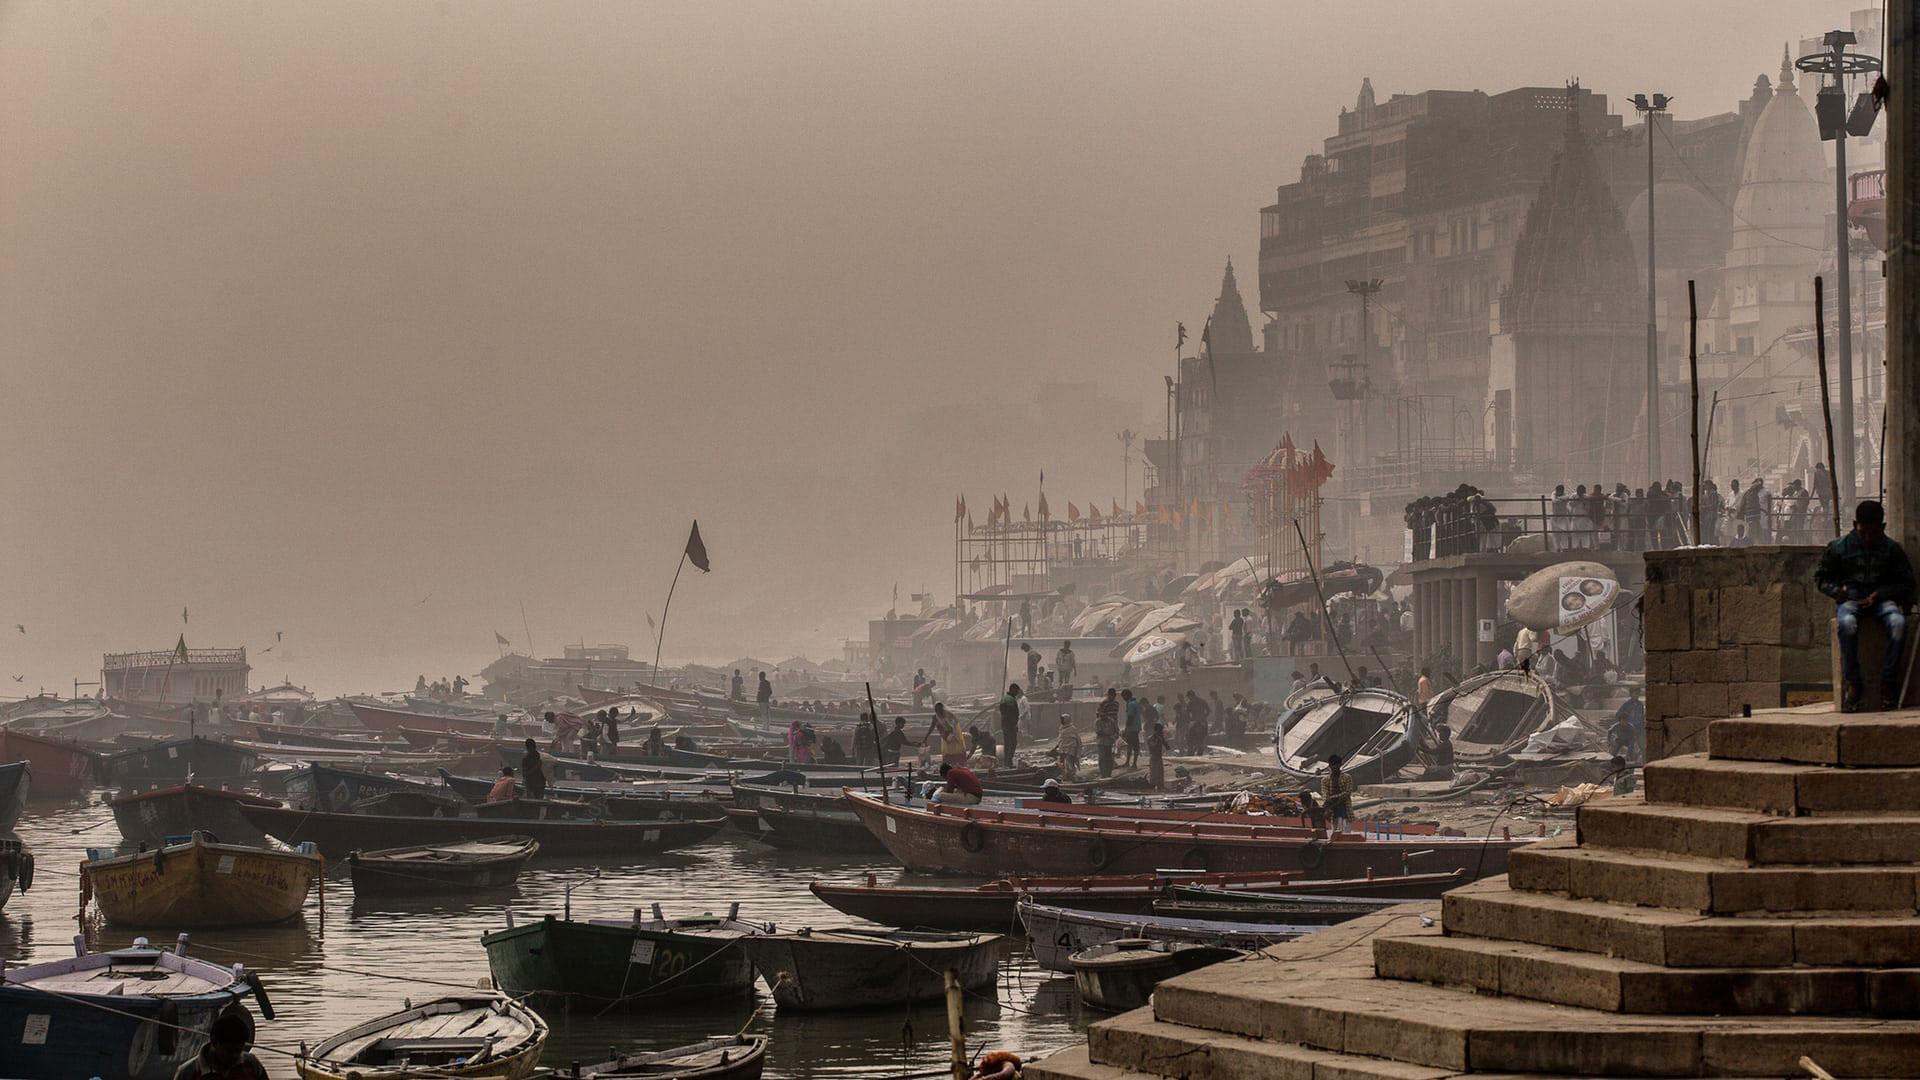 El Río Ganges por Felipe de Castro Hota Hoffmann Martins